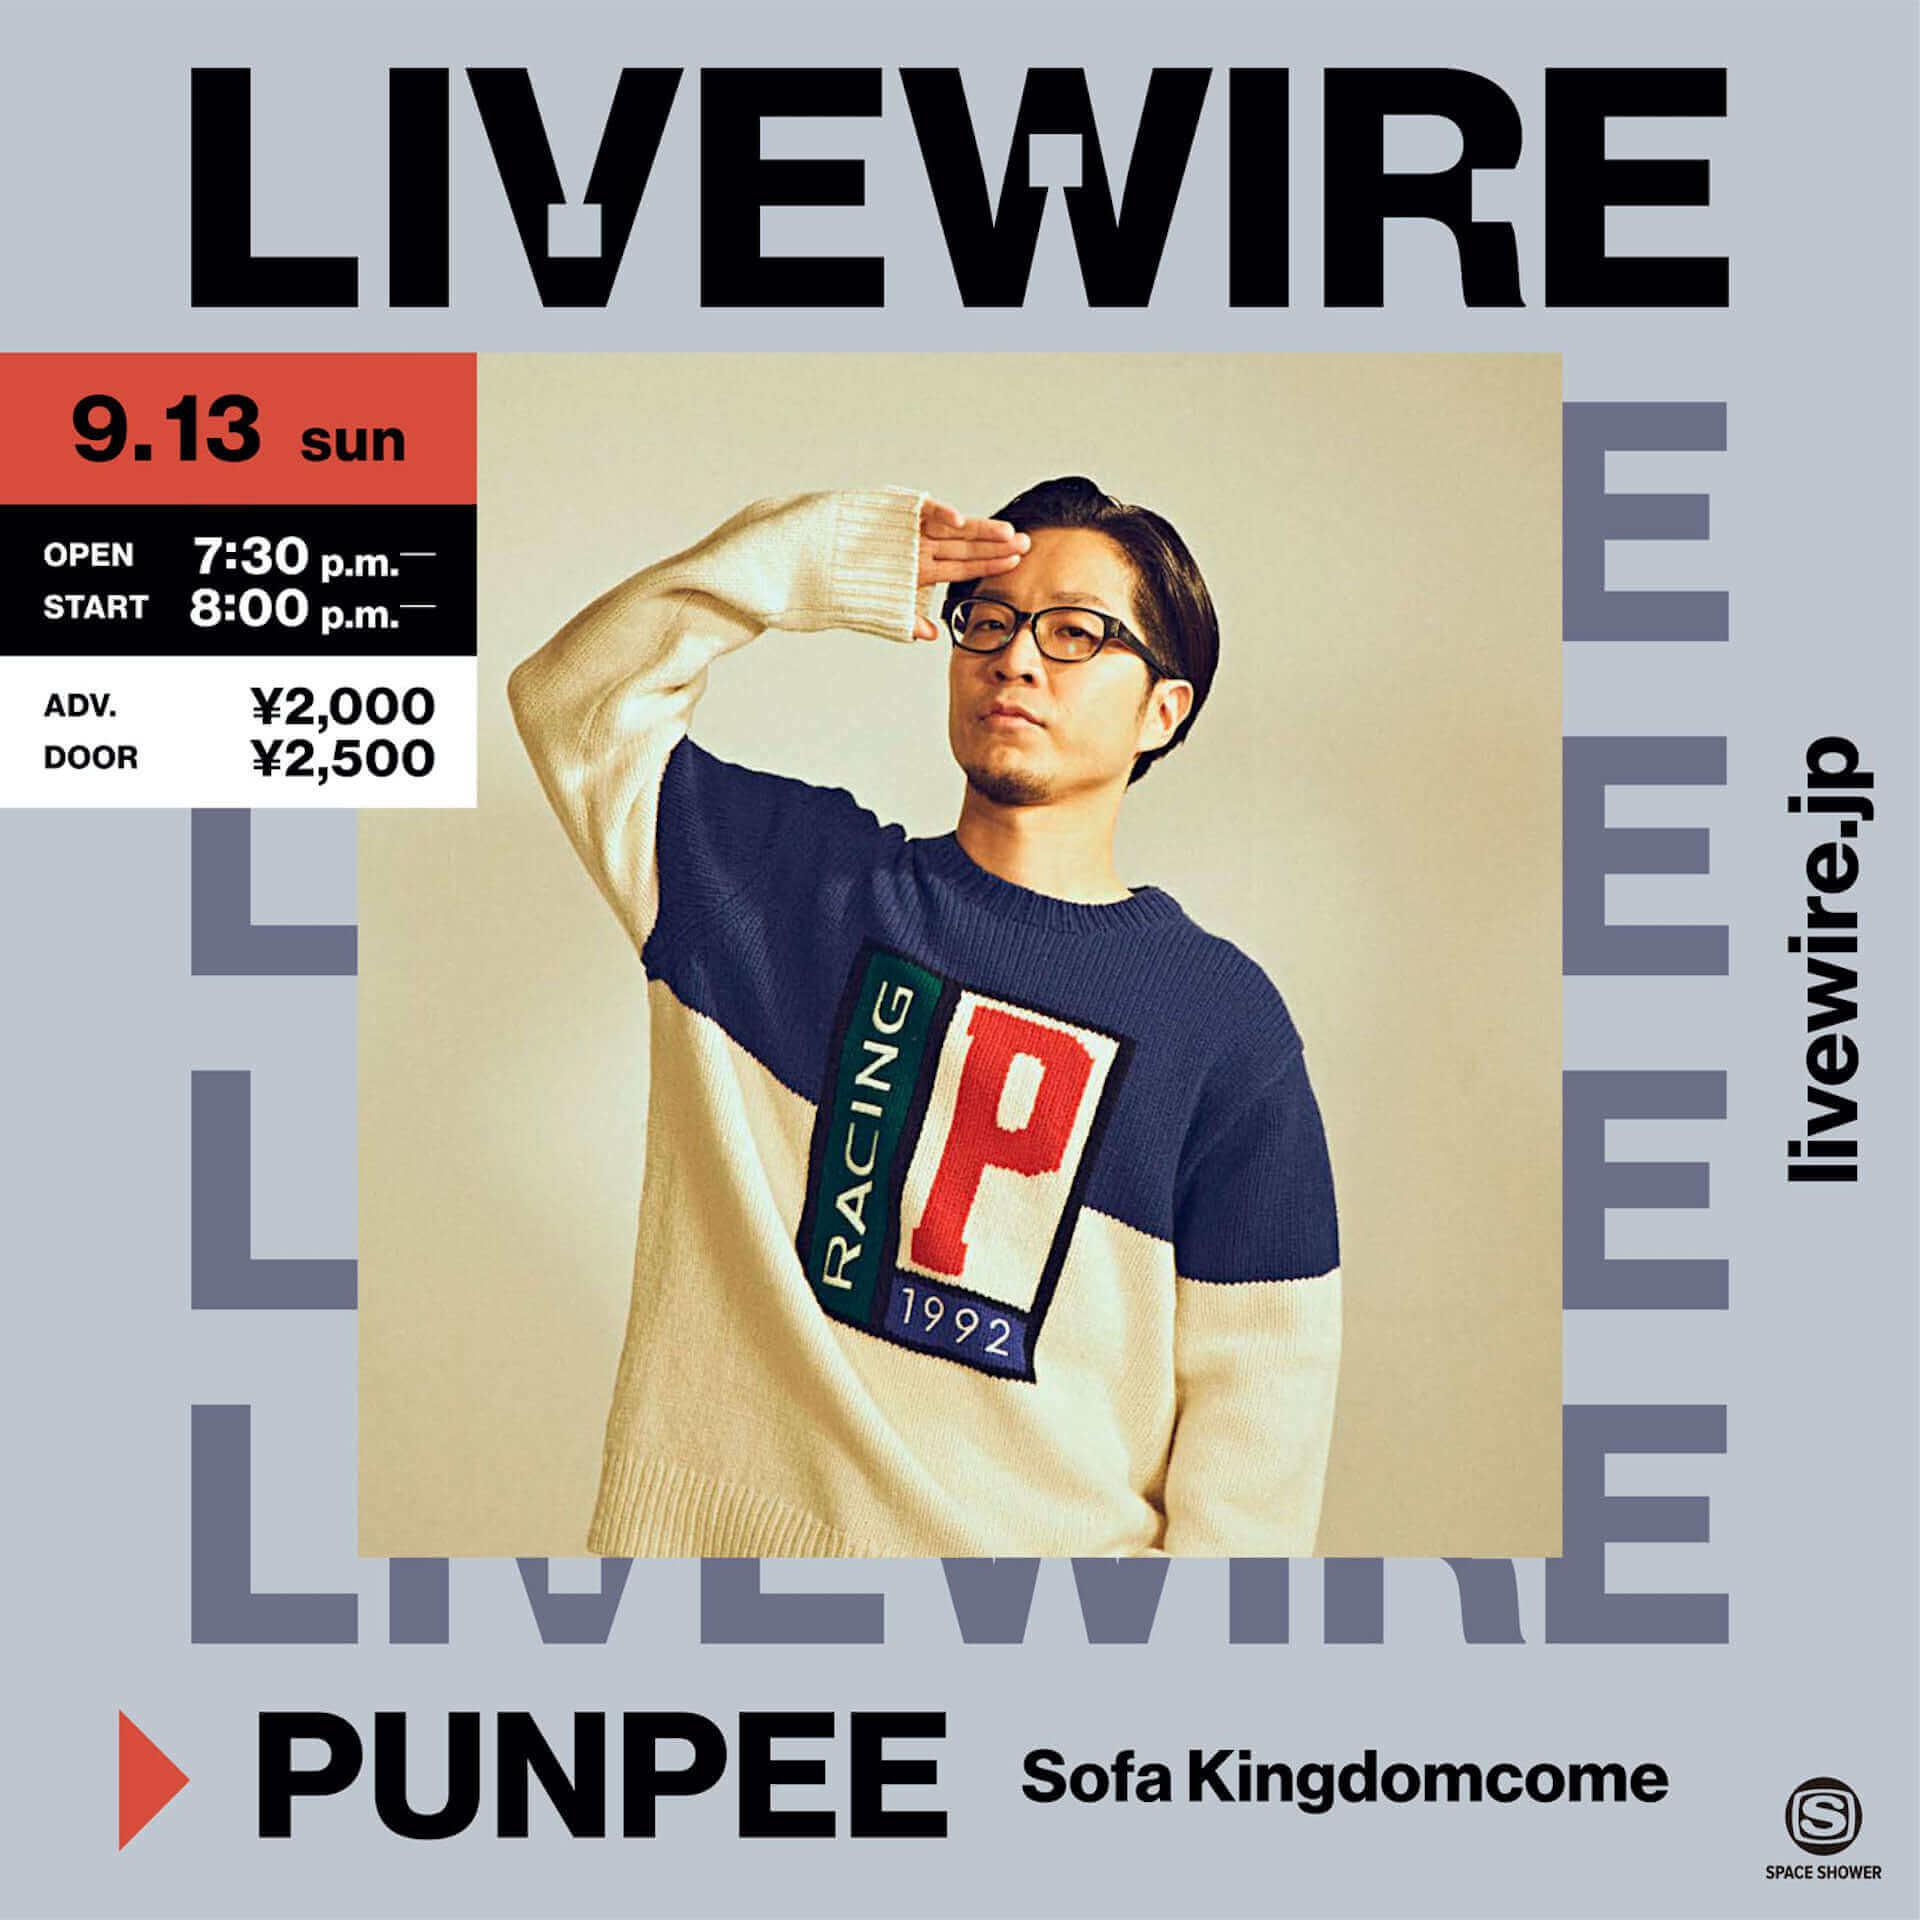 LIVEWIRE PUNPEE<Sofa Kingdomcome>のイースターエッグを一挙紹介! by みやーんZZ music200918_punpee_livewire_19